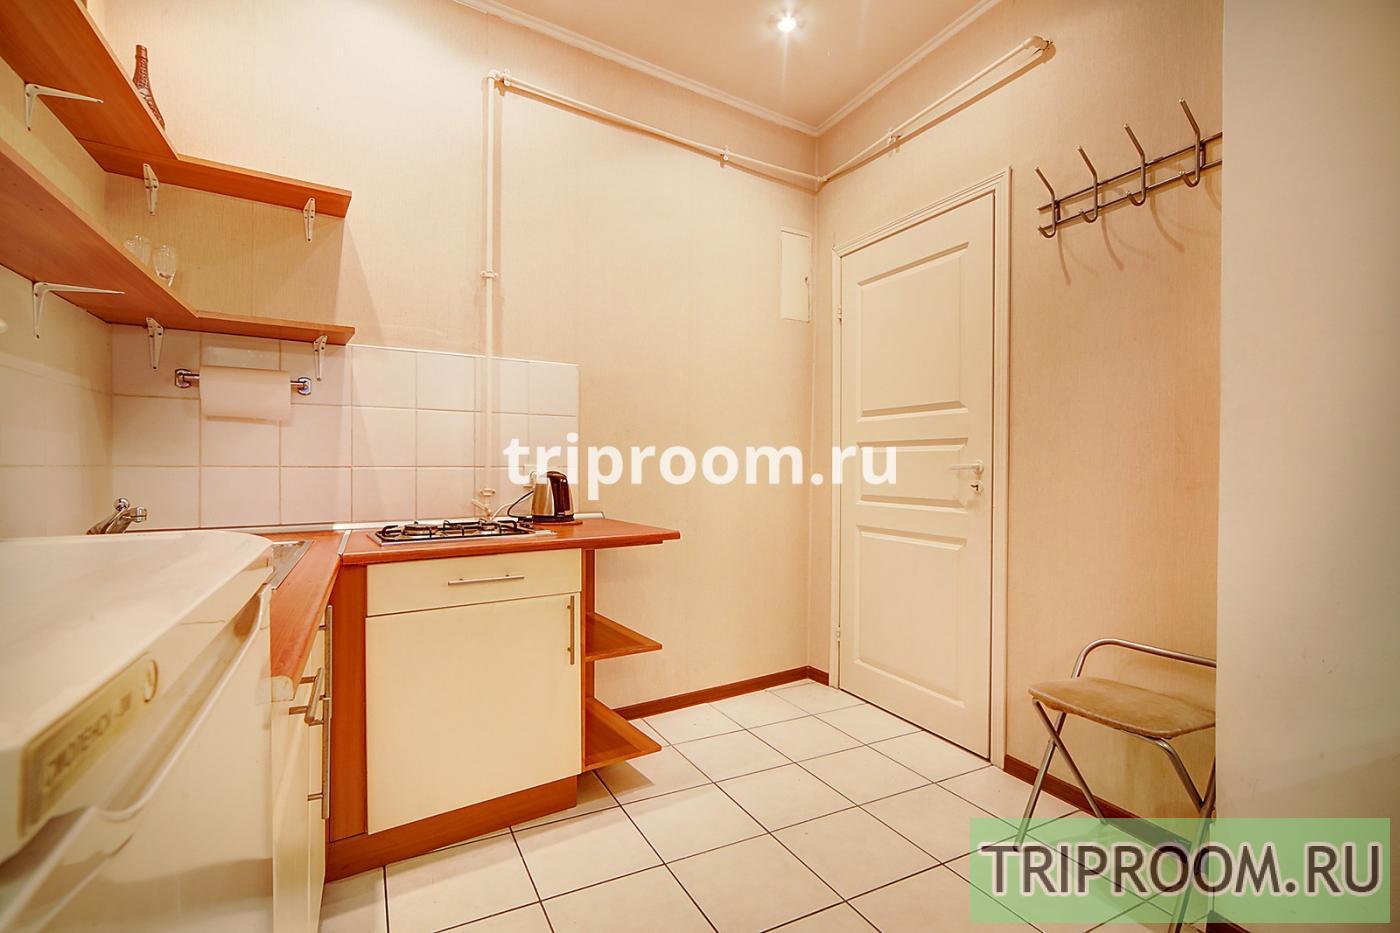 1-комнатная квартира посуточно (вариант № 15082), ул. Невский проспект, фото № 11